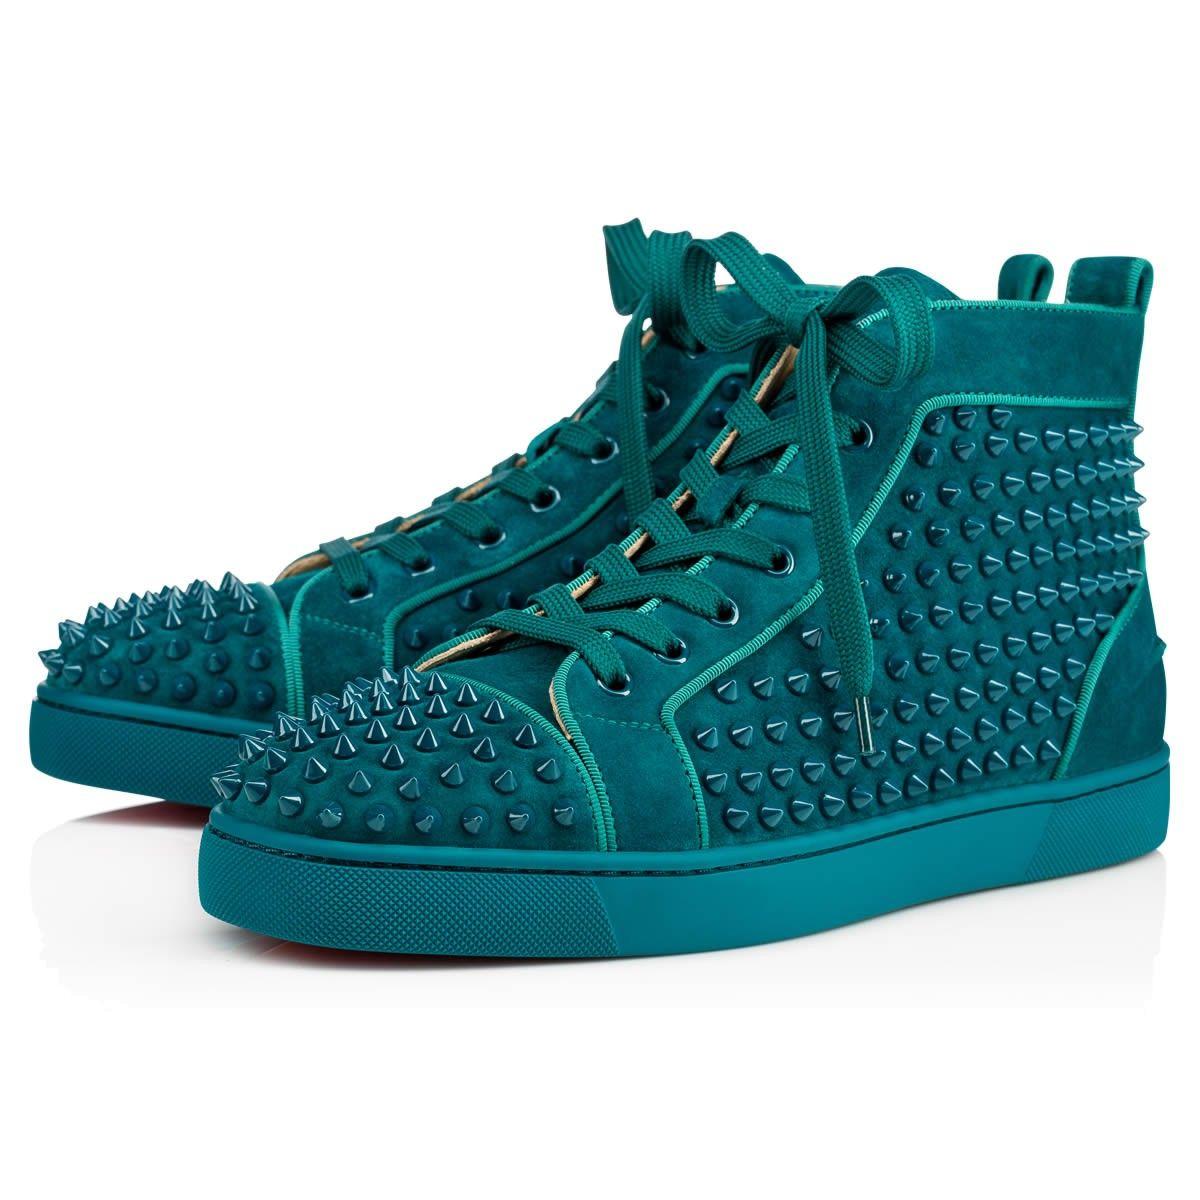 Shoes - Louis Orlato Spikes Men\u0027s Flat - Christian Louboutin